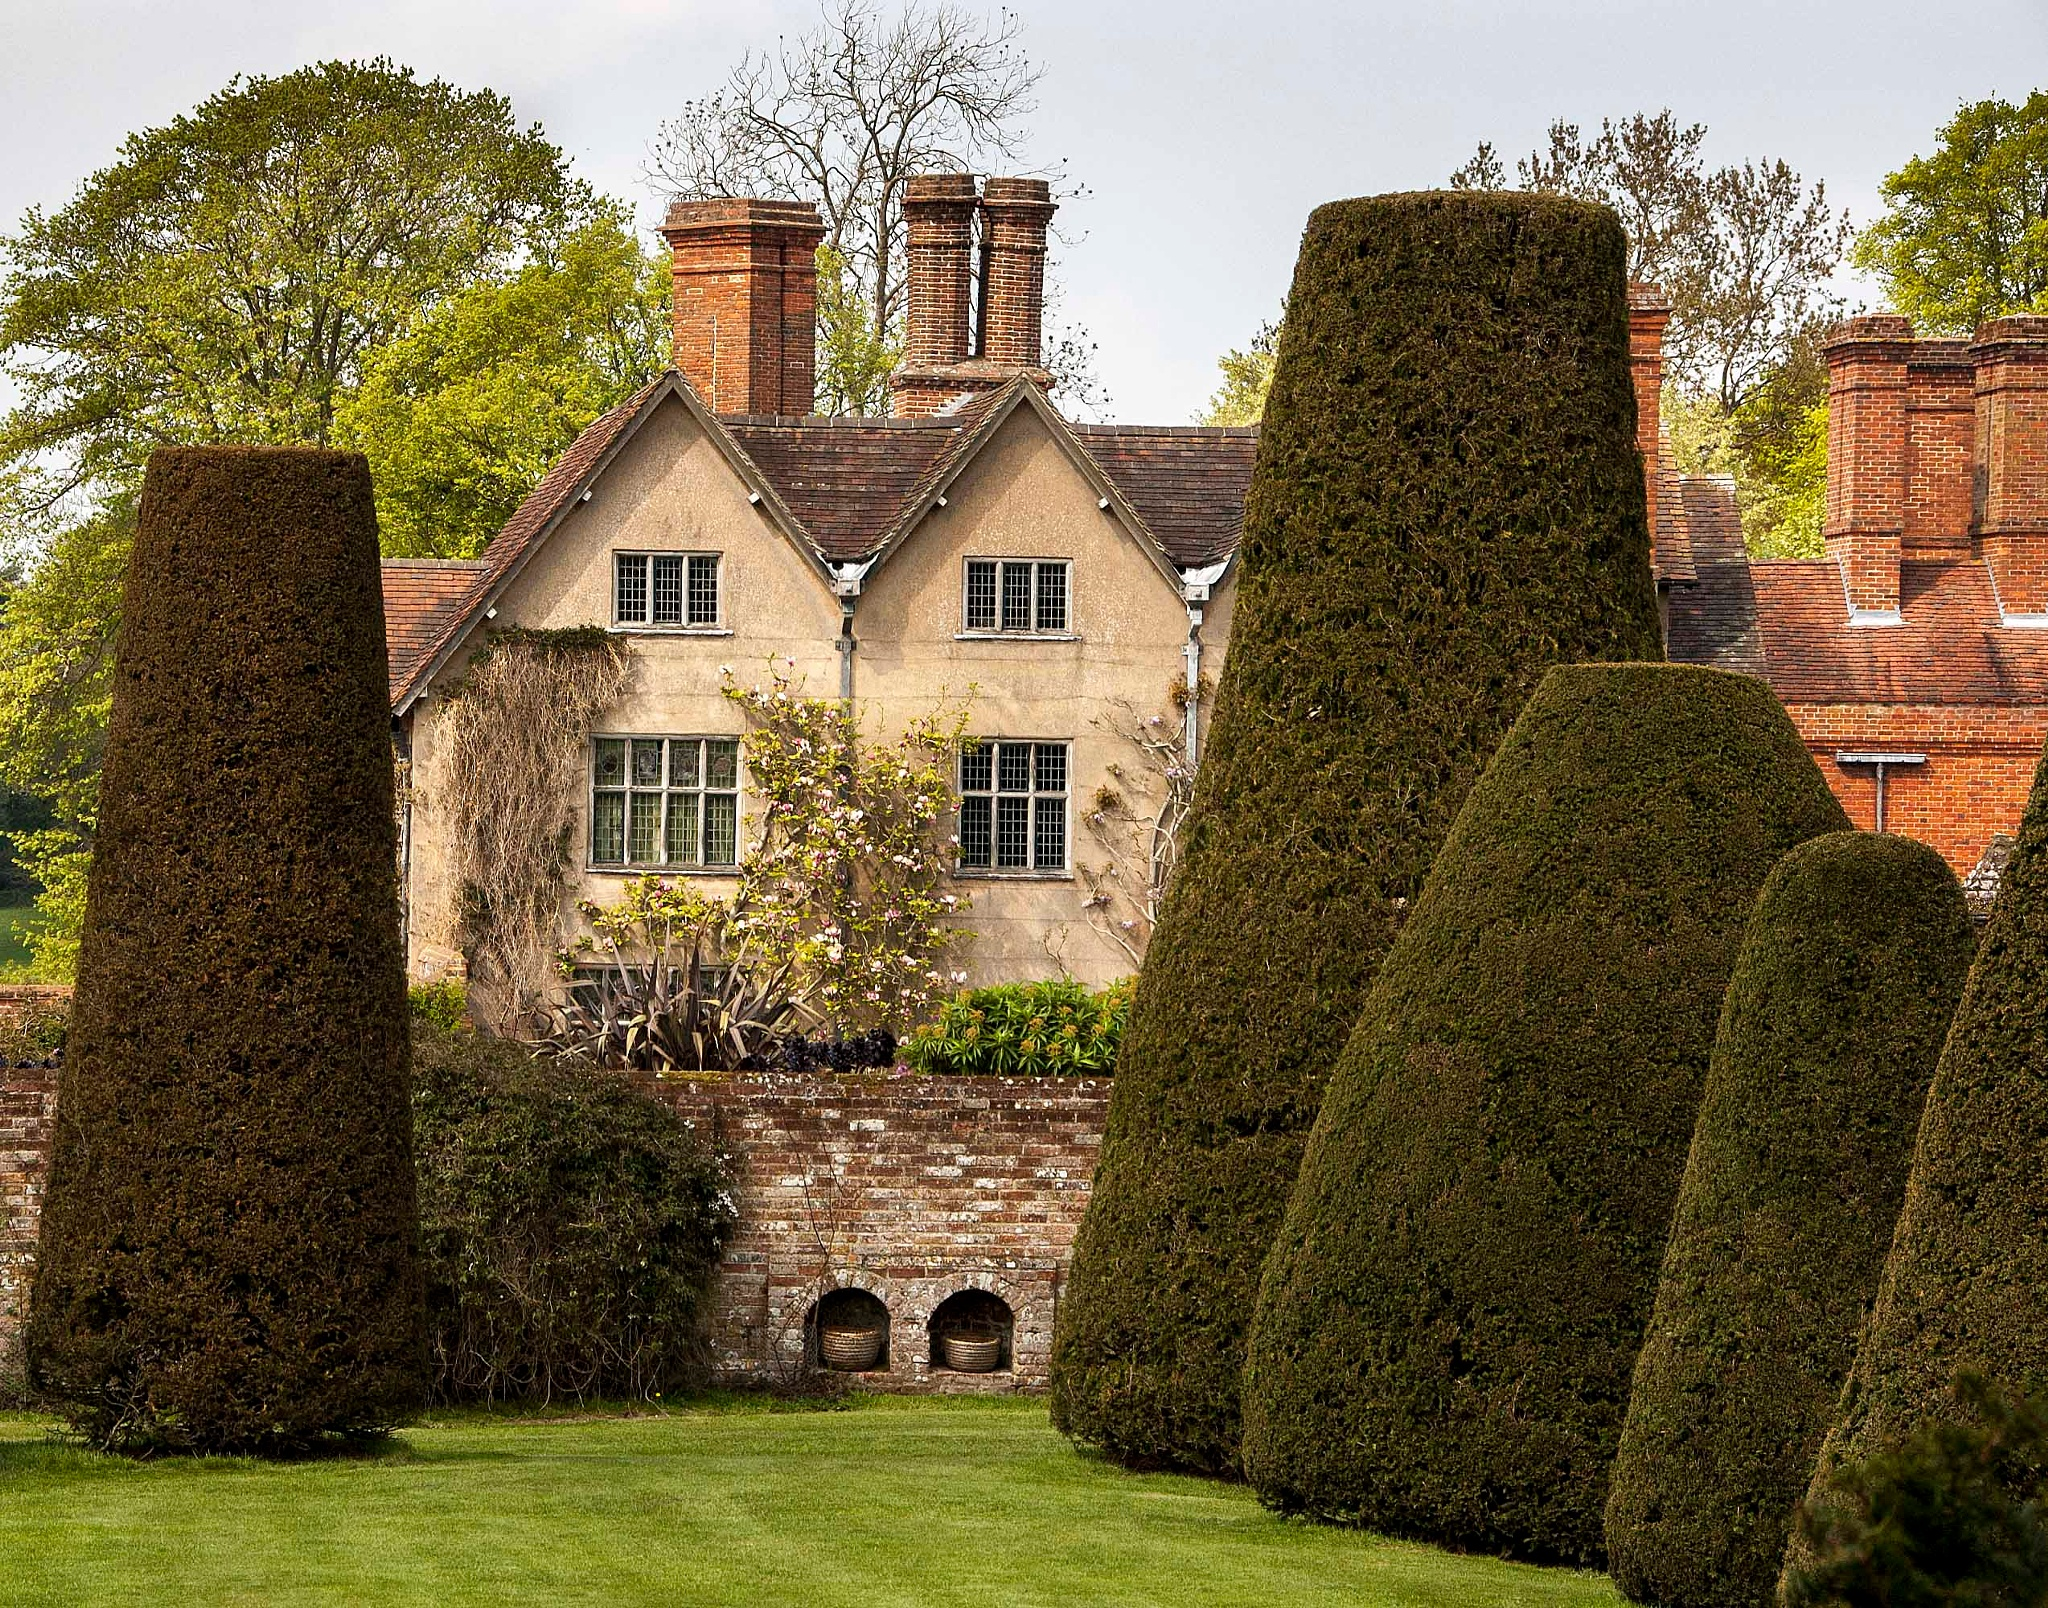 Packwood House by Haydn Bailey